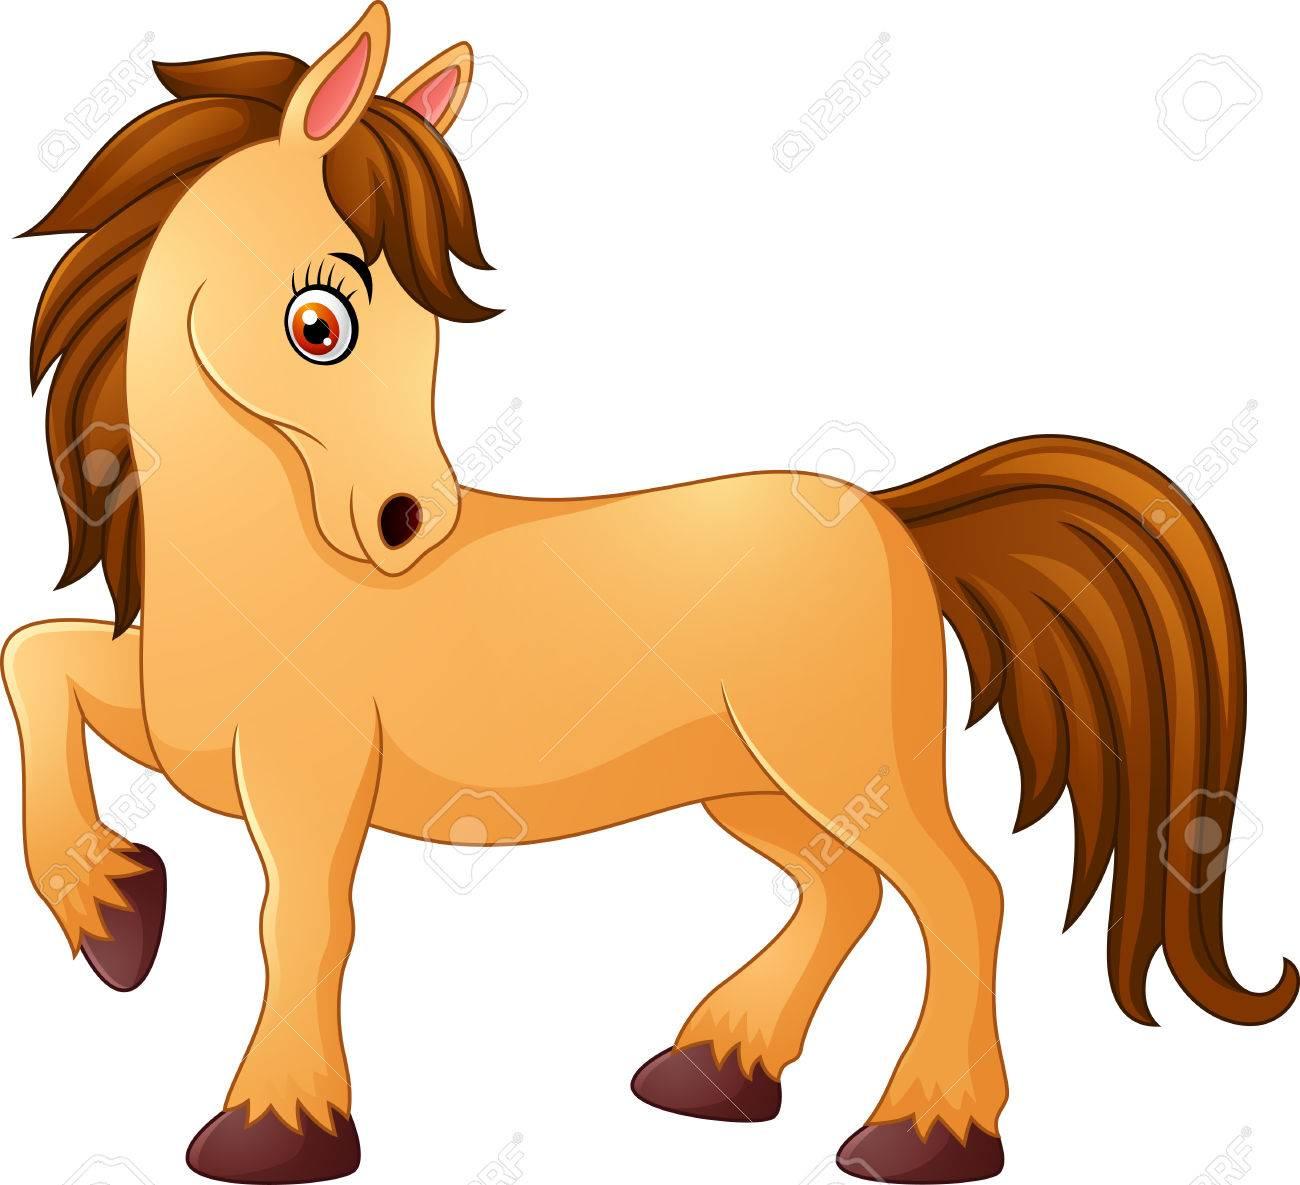 Cute Horse Cartoon Royalty Free Cliparts Vectors And Stock Illustration Image 62046788